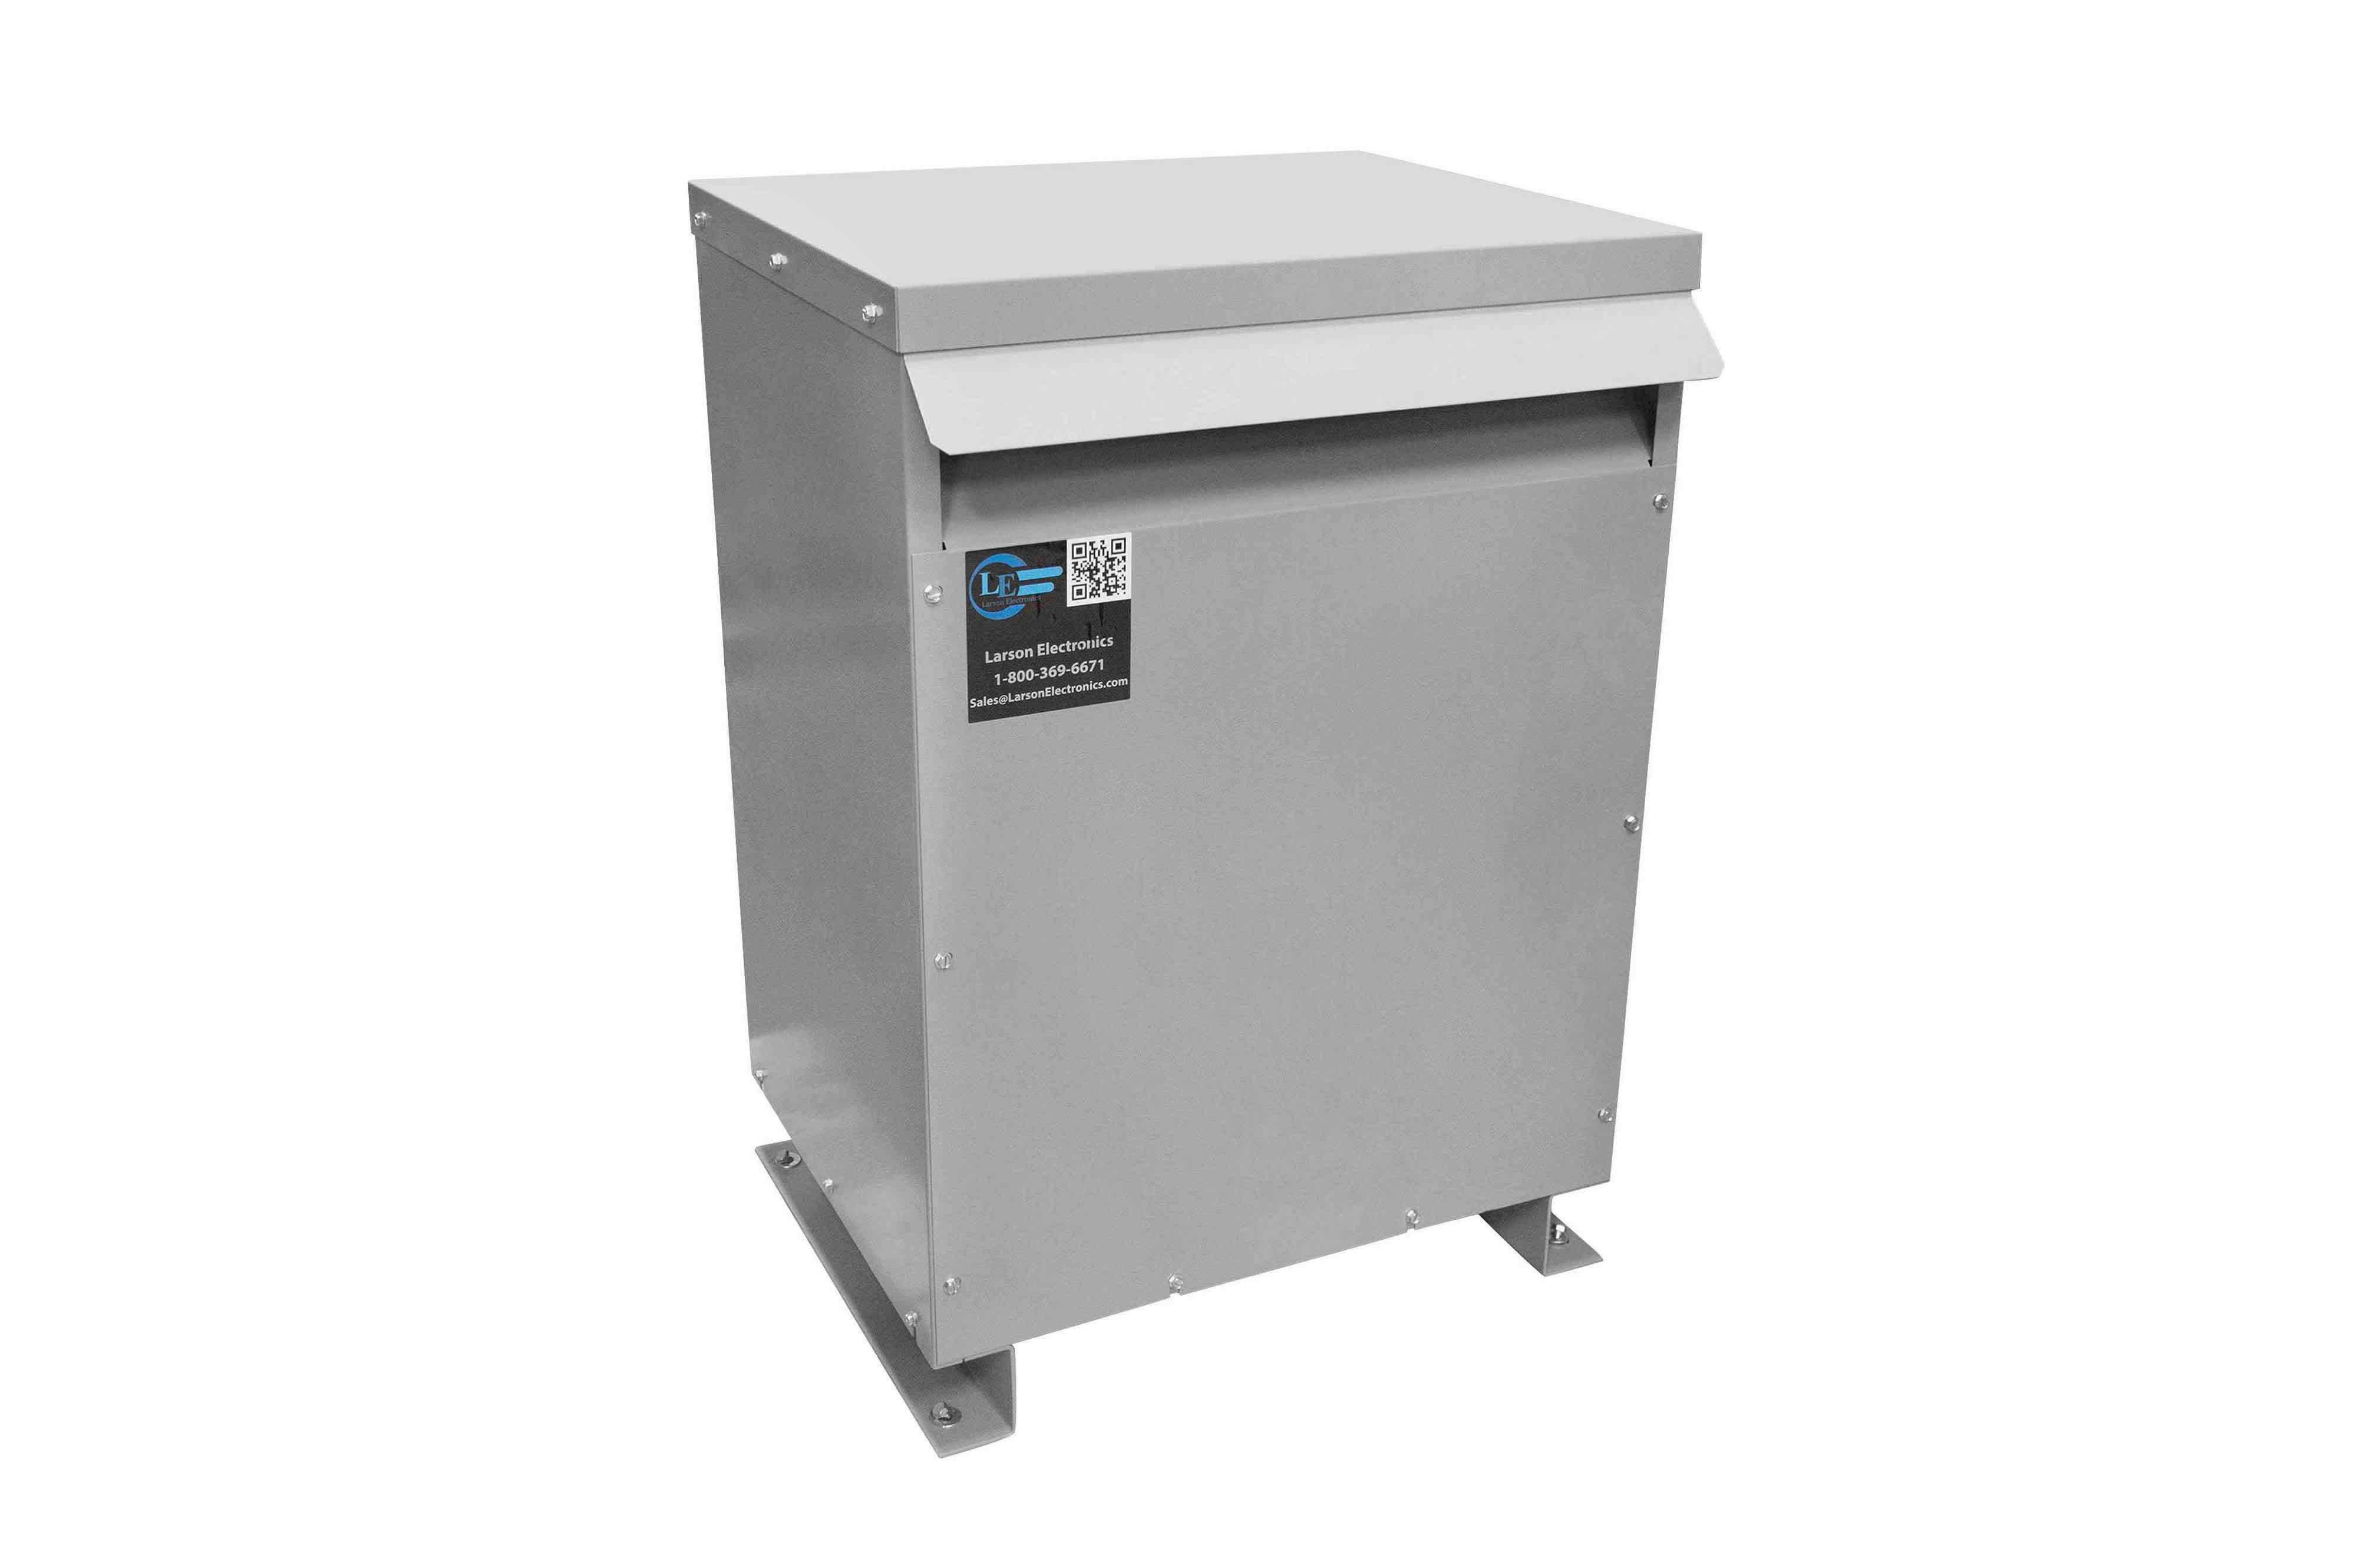 55 kVA 3PH Isolation Transformer, 480V Wye Primary, 380Y/220 Wye-N Secondary, N3R, Ventilated, 60 Hz